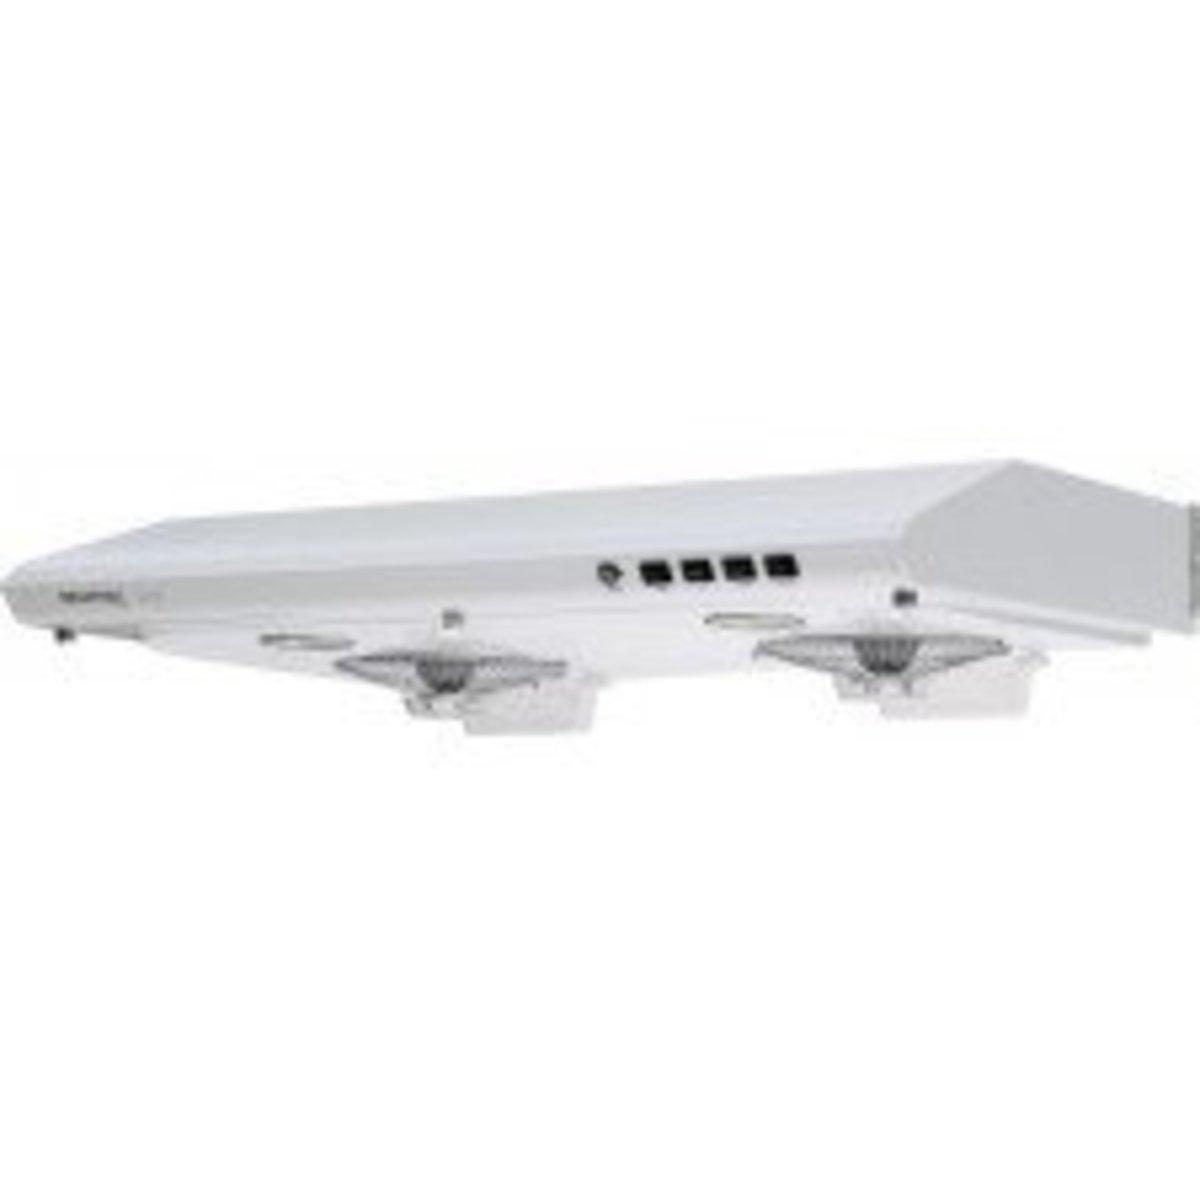 "FV-712N ""雙千翼渦輪""抽油煙機 (輕觸式) (LED 燈型號) 白色"